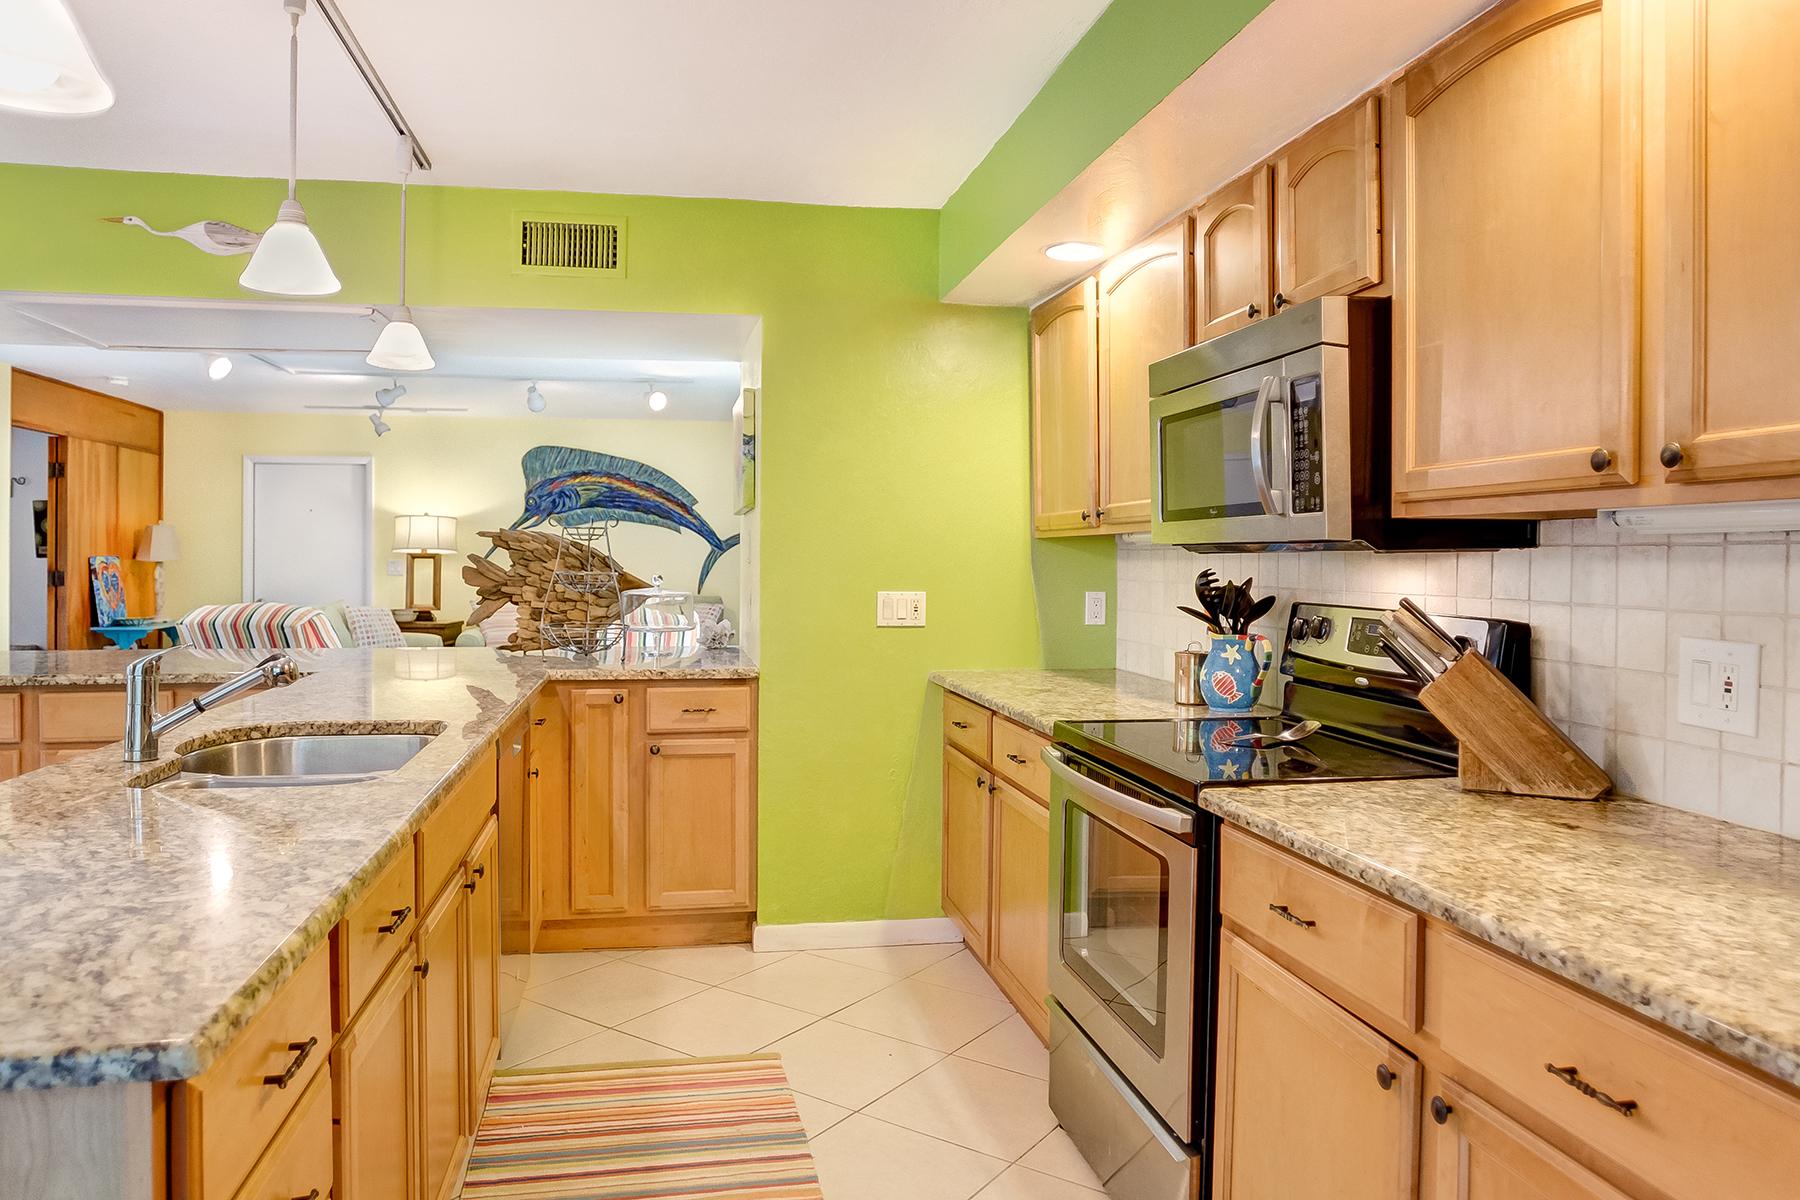 Additional photo for property listing at SANIBEL 1035 S Yachtsman Dr,  Sanibel, Florida 33957 United States